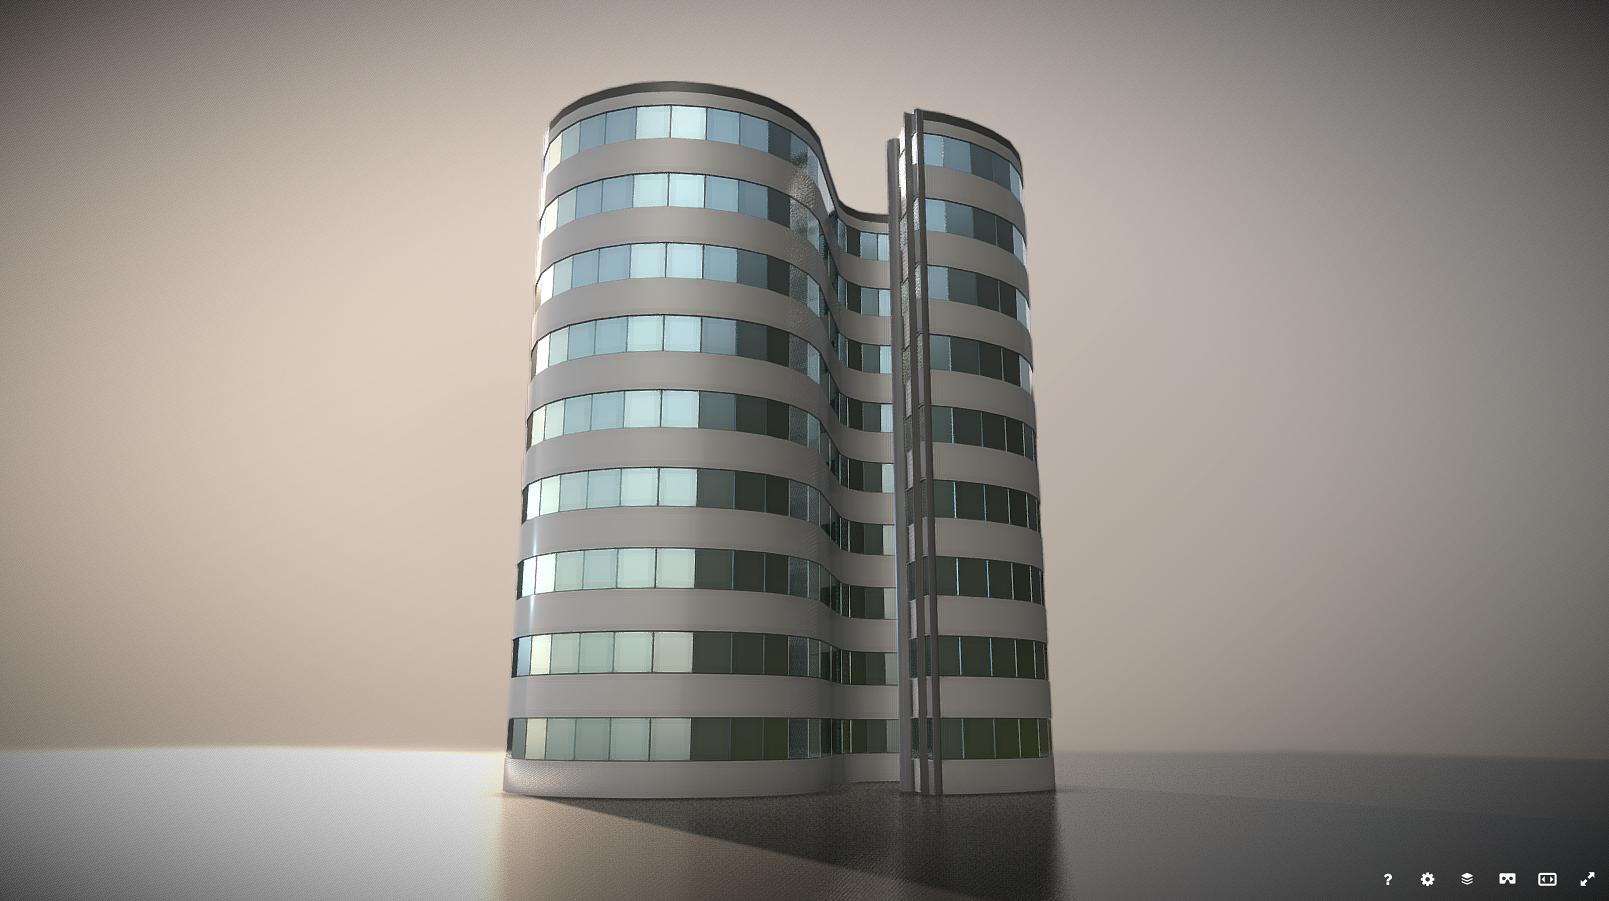 City Building Design S 1 On Sketchfab Building Design City Buildings Design